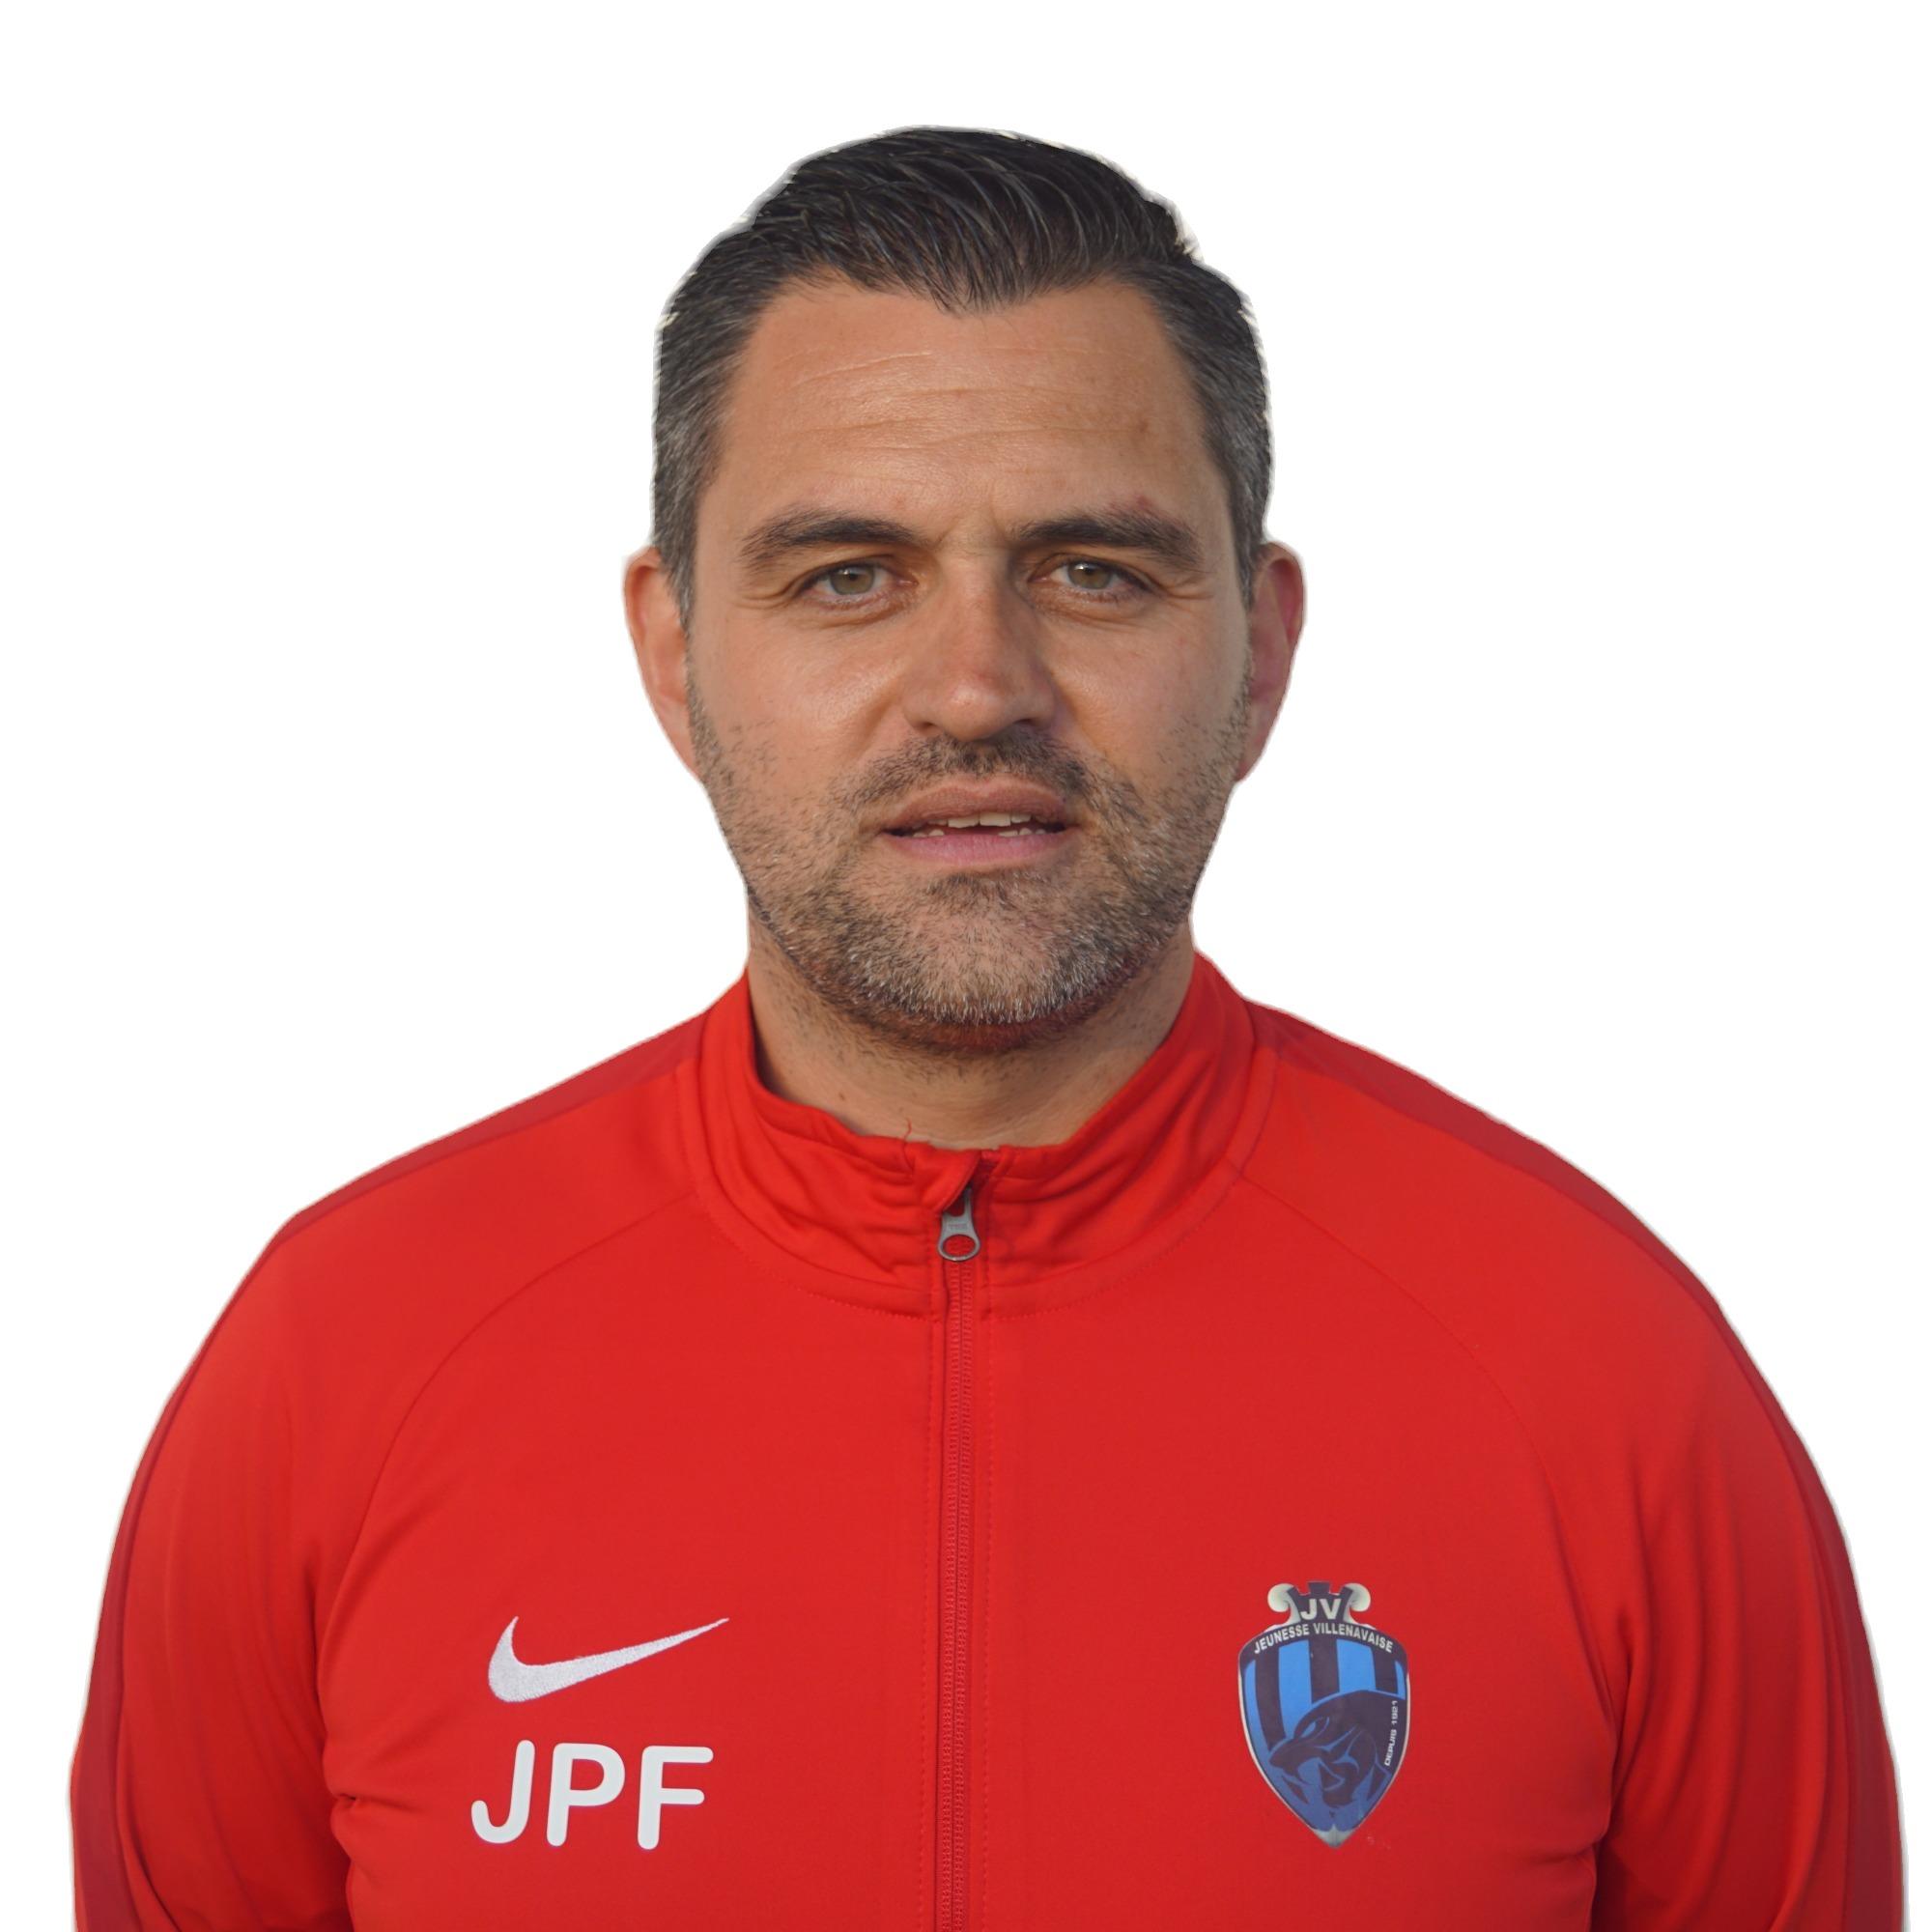 Jean-Philippe Francois